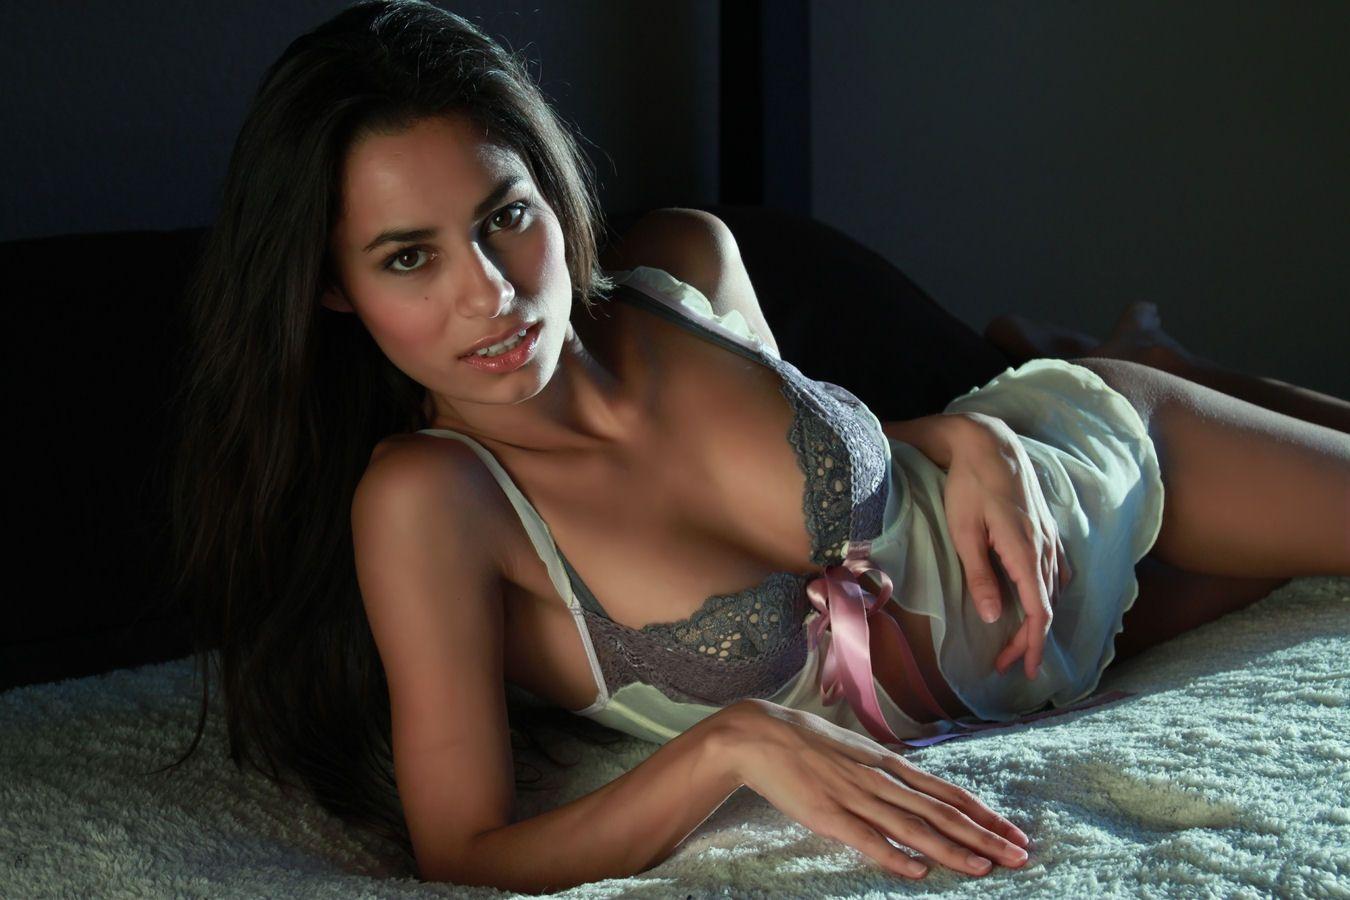 Cheyenne gordon porn